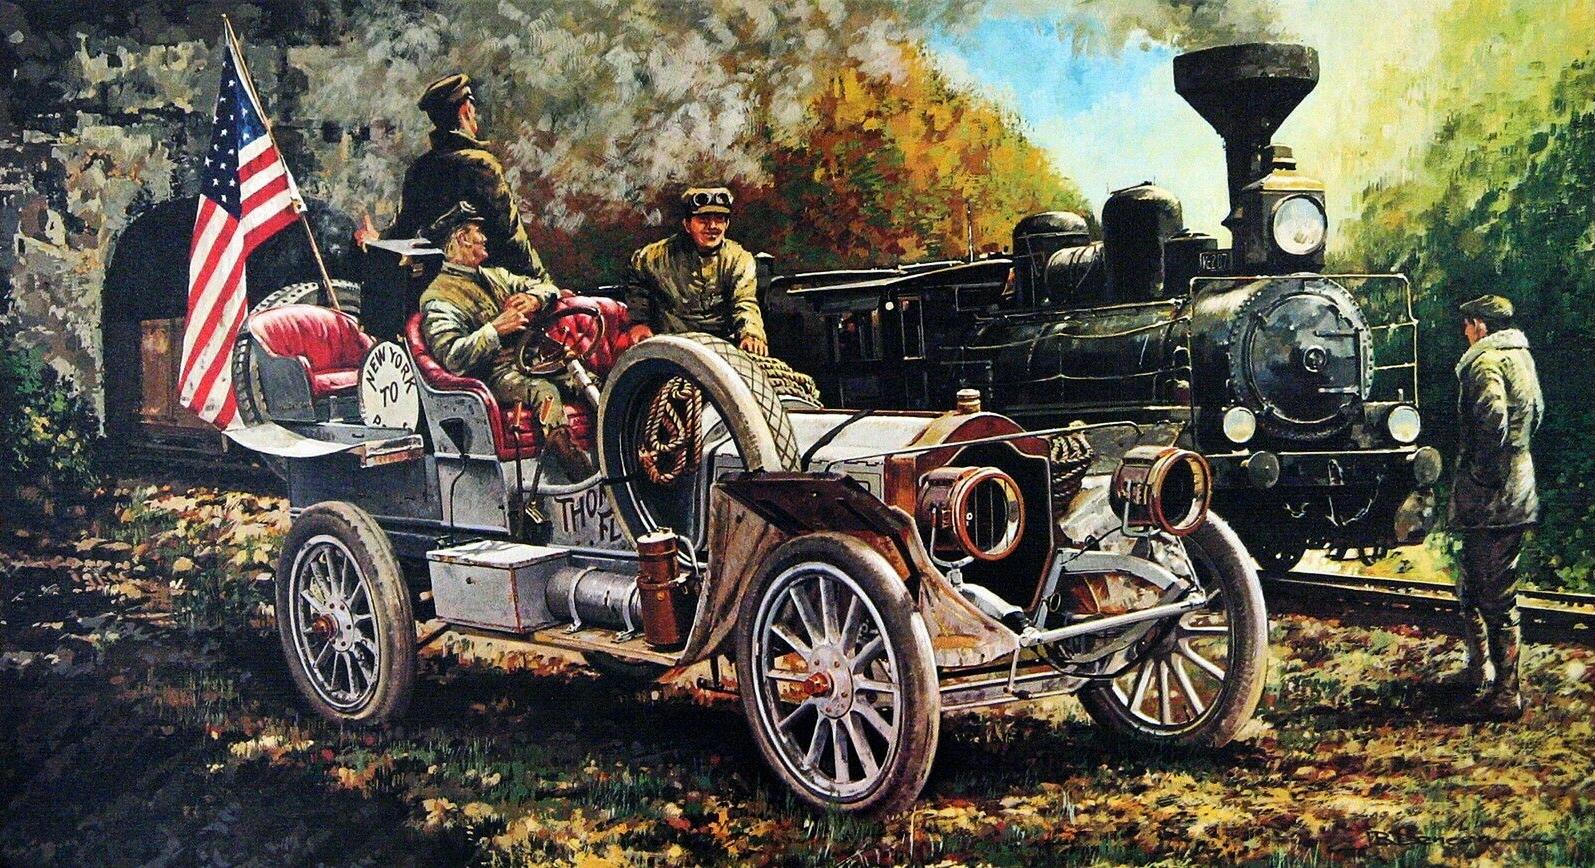 1907. Thomas. Illustrated by James B. Deneen